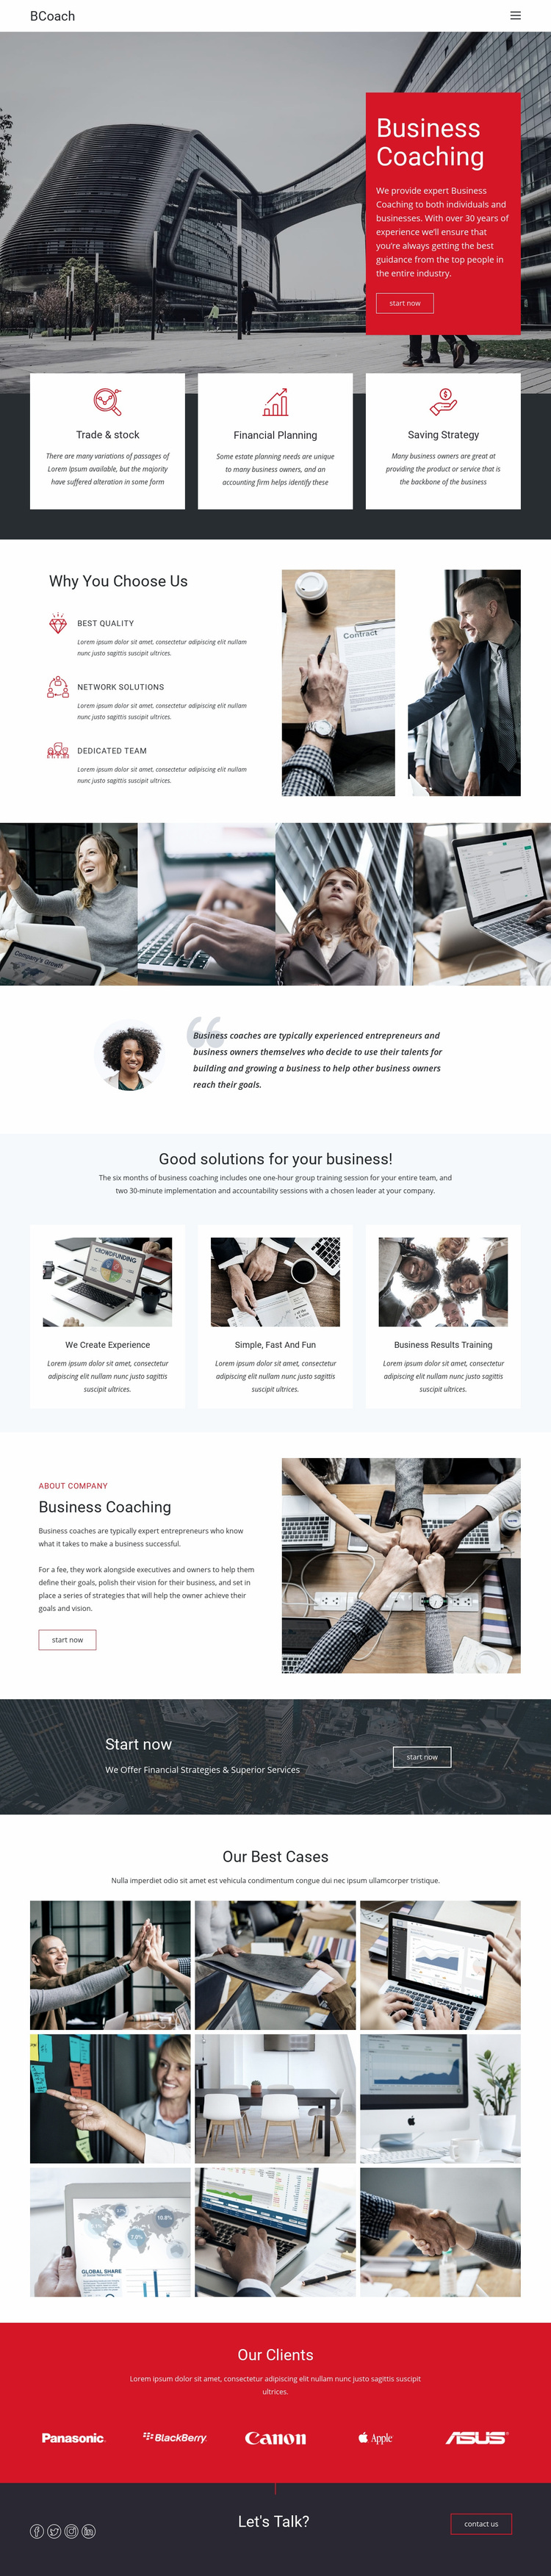 Executive coaching Web Page Designer